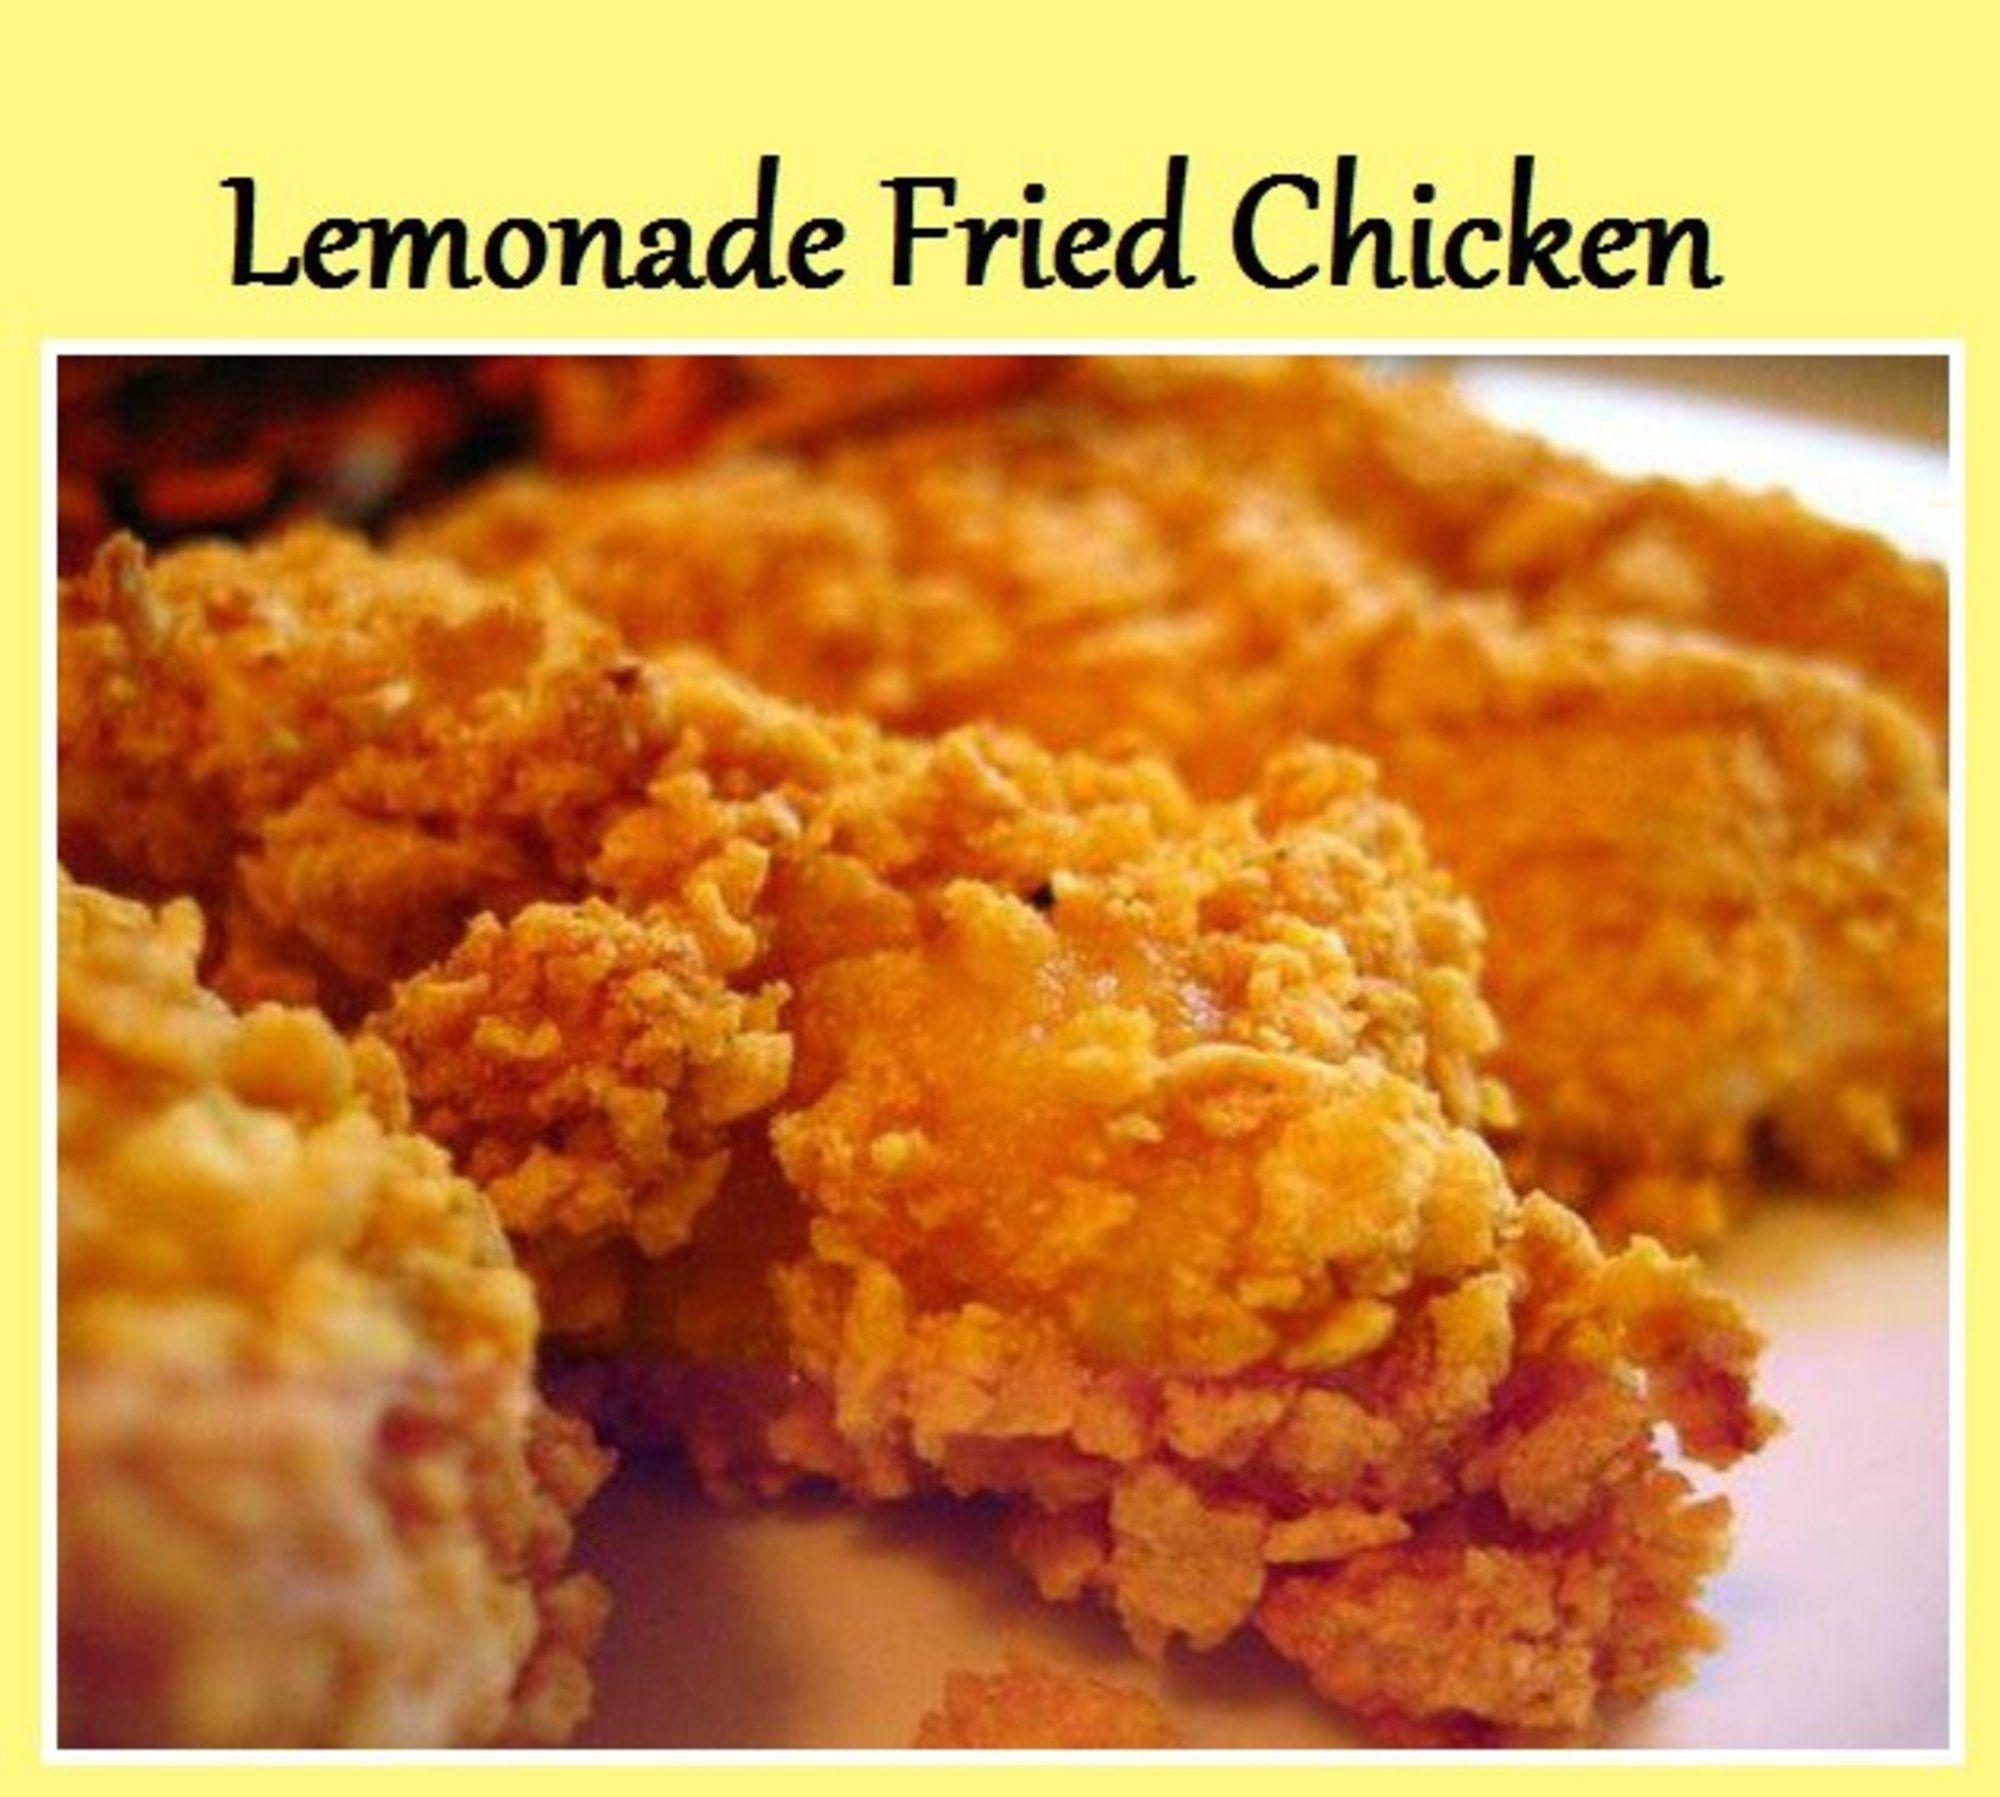 Lemonade Fried Chicken Recipe Convection Oven Recipes Fried Chicken Recipes Food Recipes